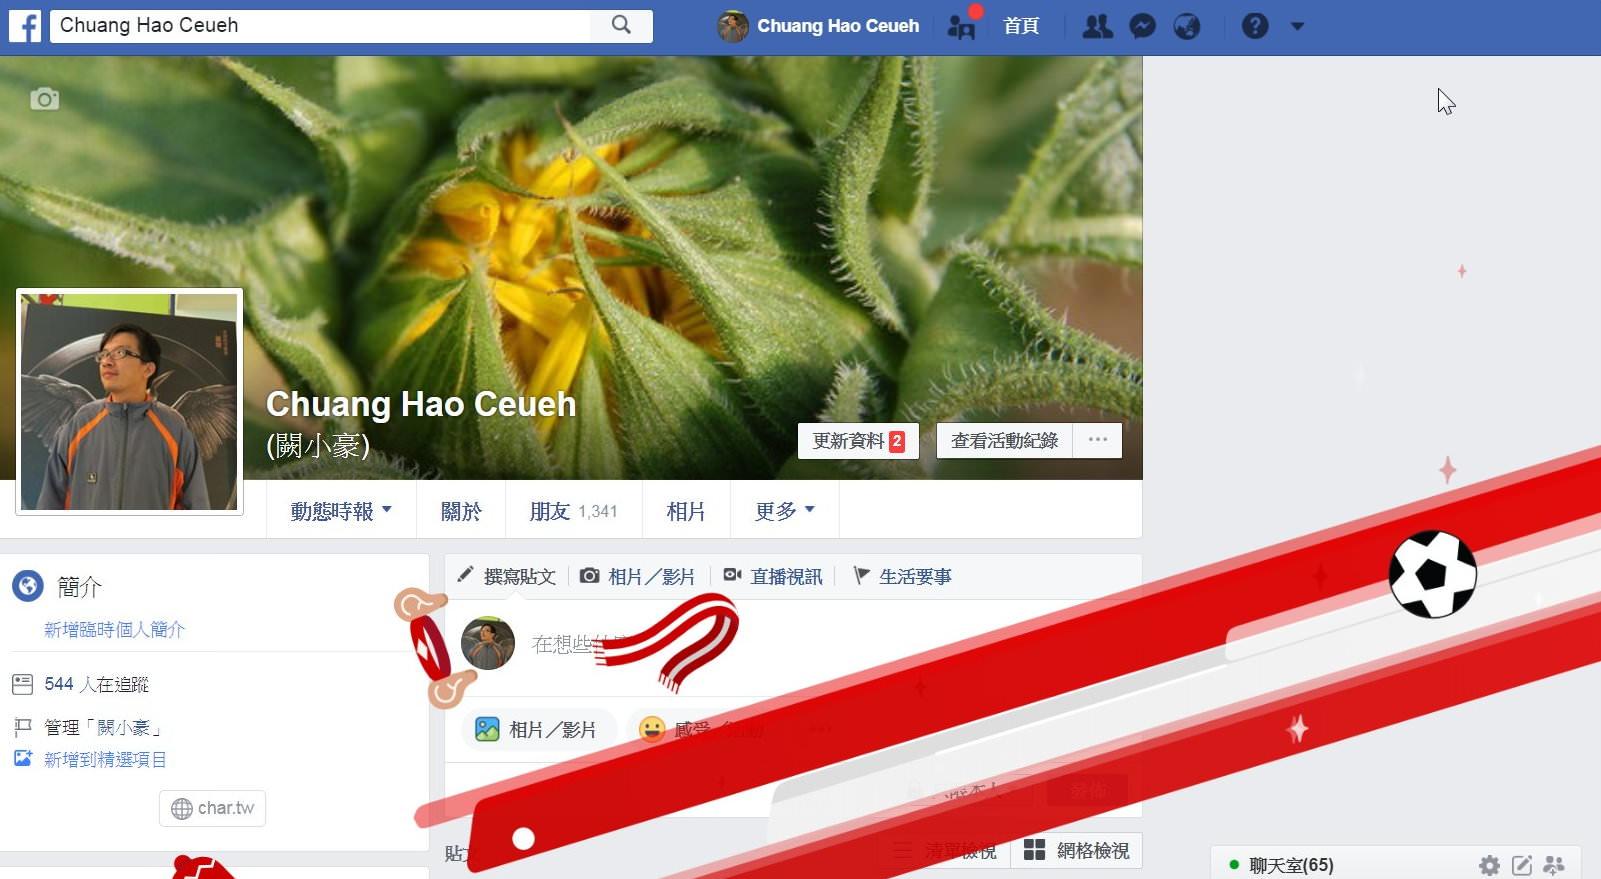 Facebook, 特殊動畫效果關鍵字, 2018年世界盃足球賽